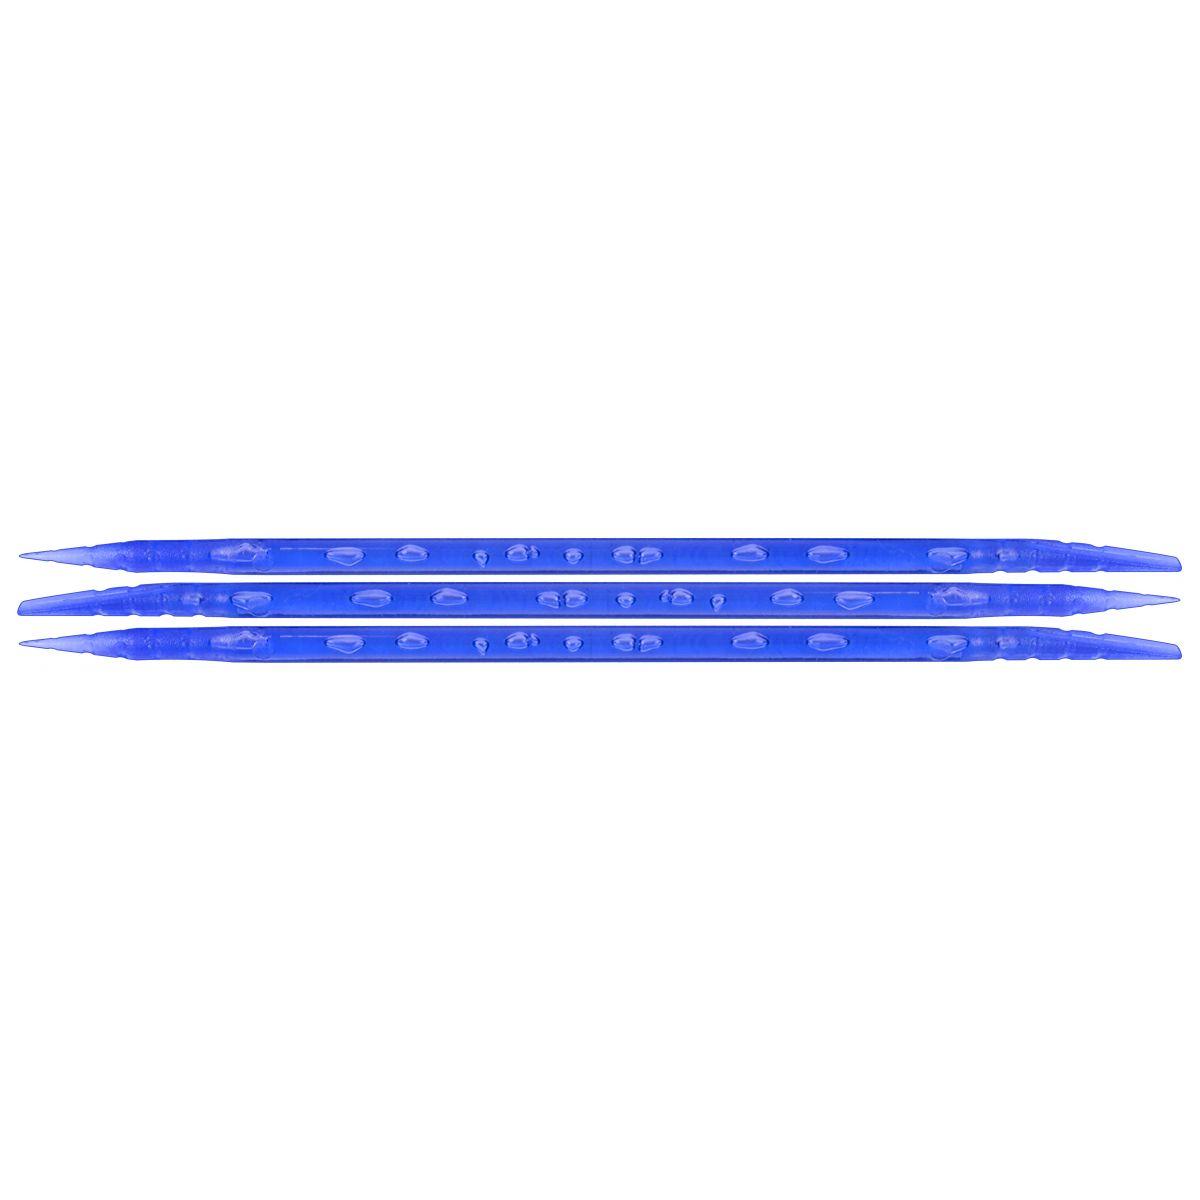 Palito Pl�stico Azul Para Manicure Descart�vel 100 Unidades